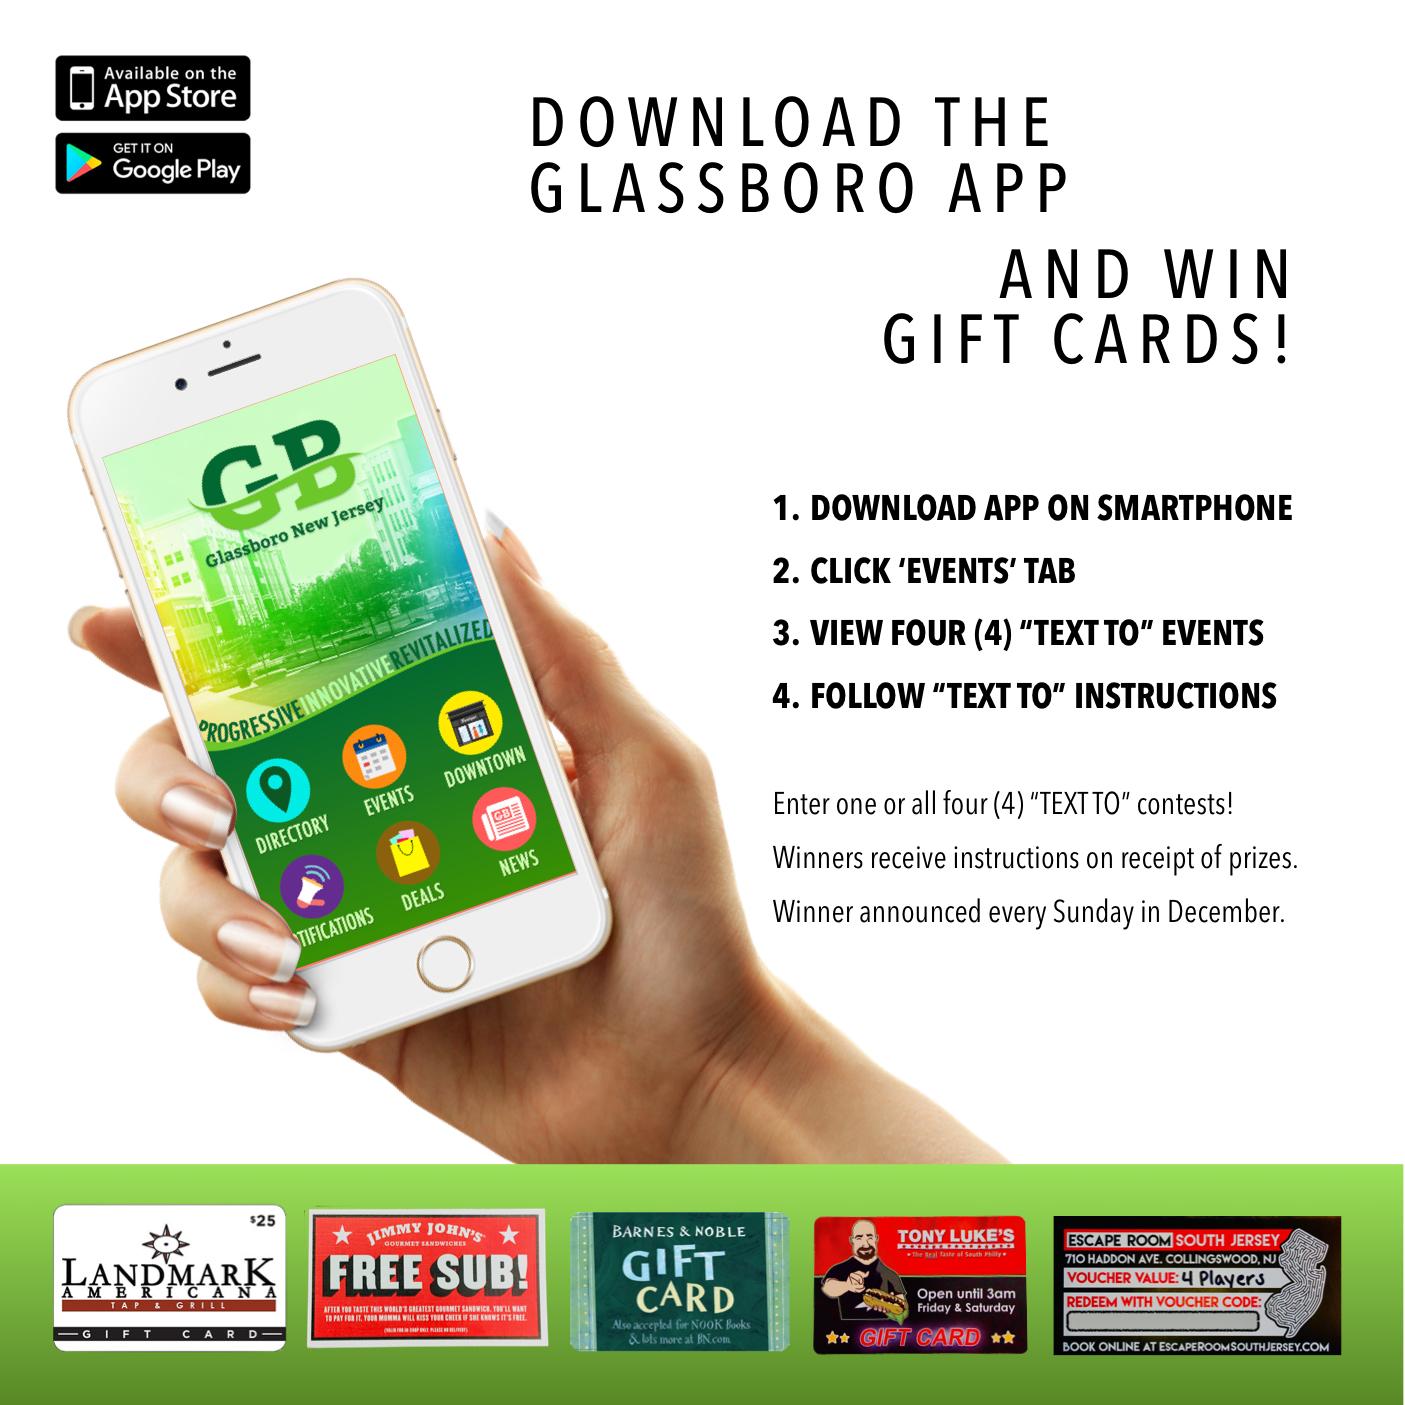 download glassboro app text to contest.jpeg